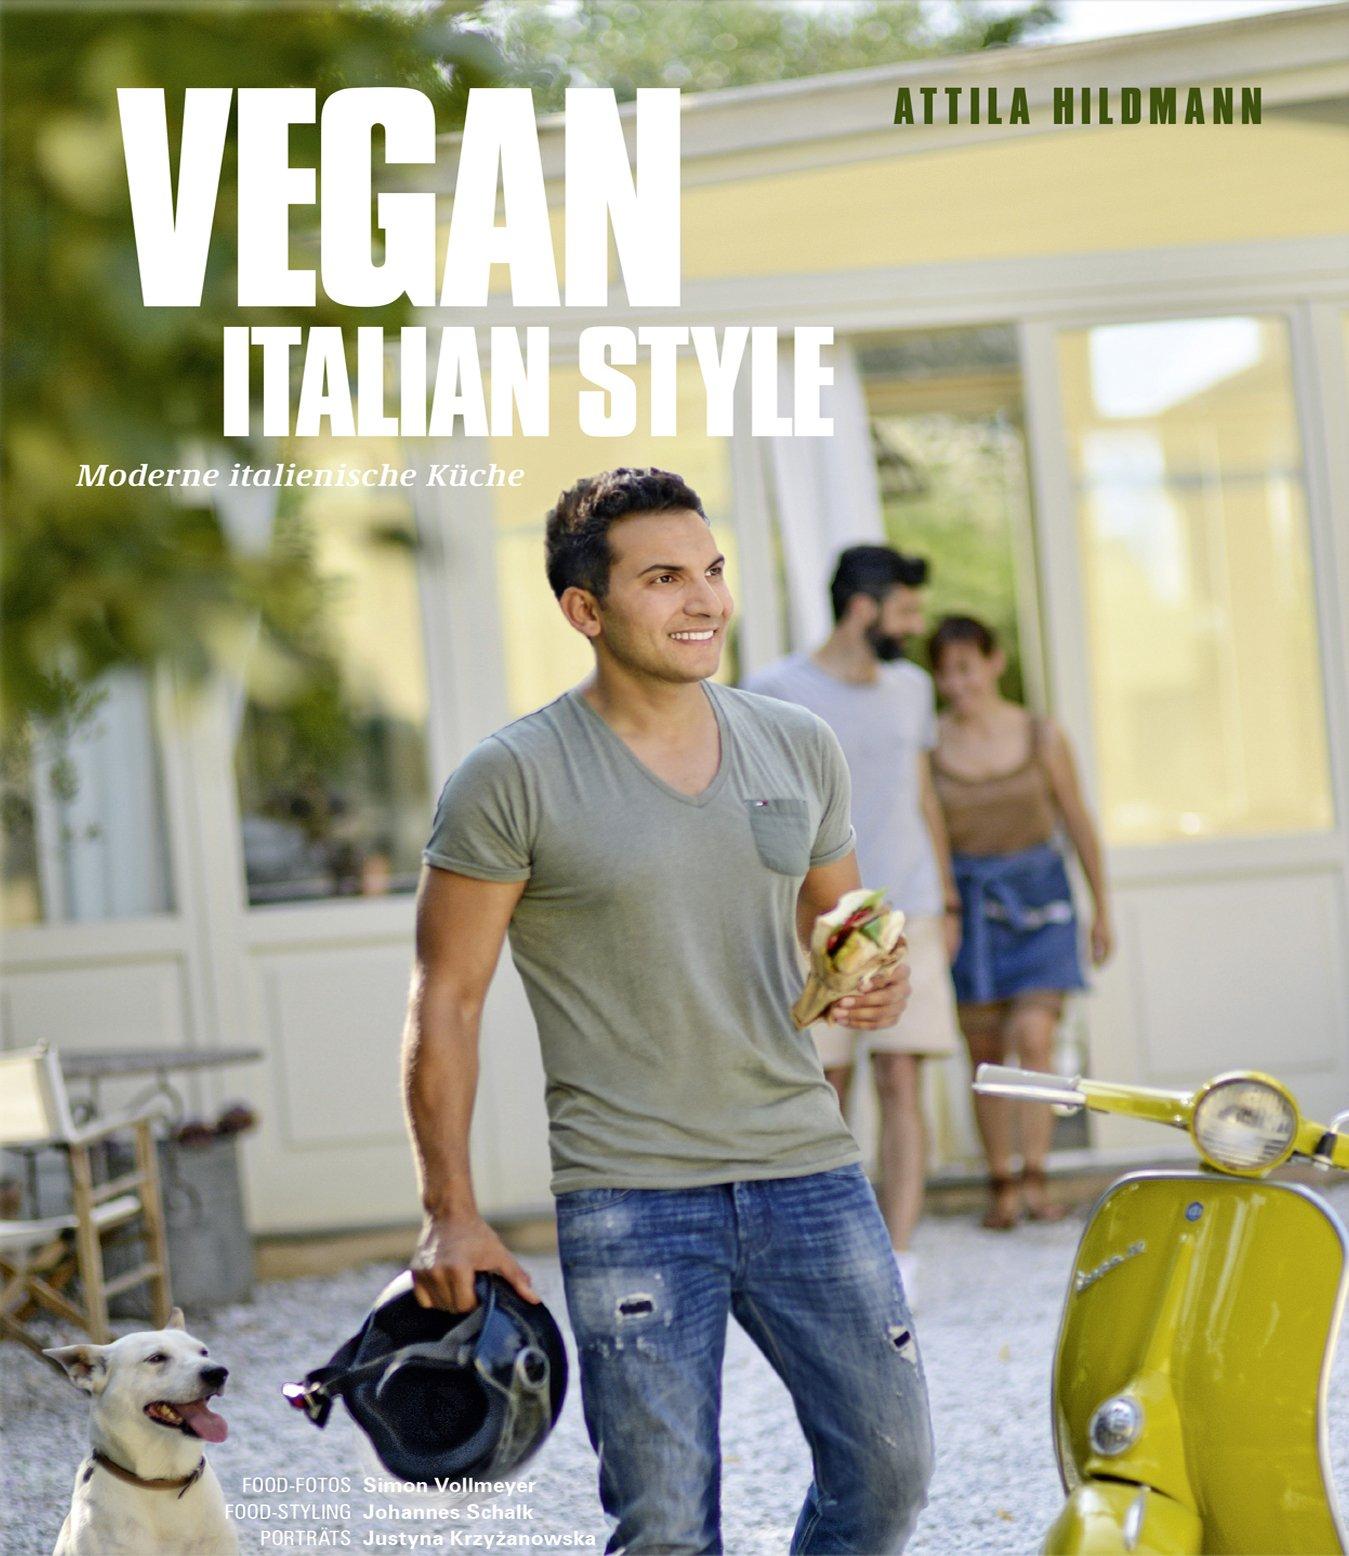 Vegan italian style moderne italienische küche vegane kochbücher von attila hildmann amazon de attila hildmann simon vollmeyer fotografie